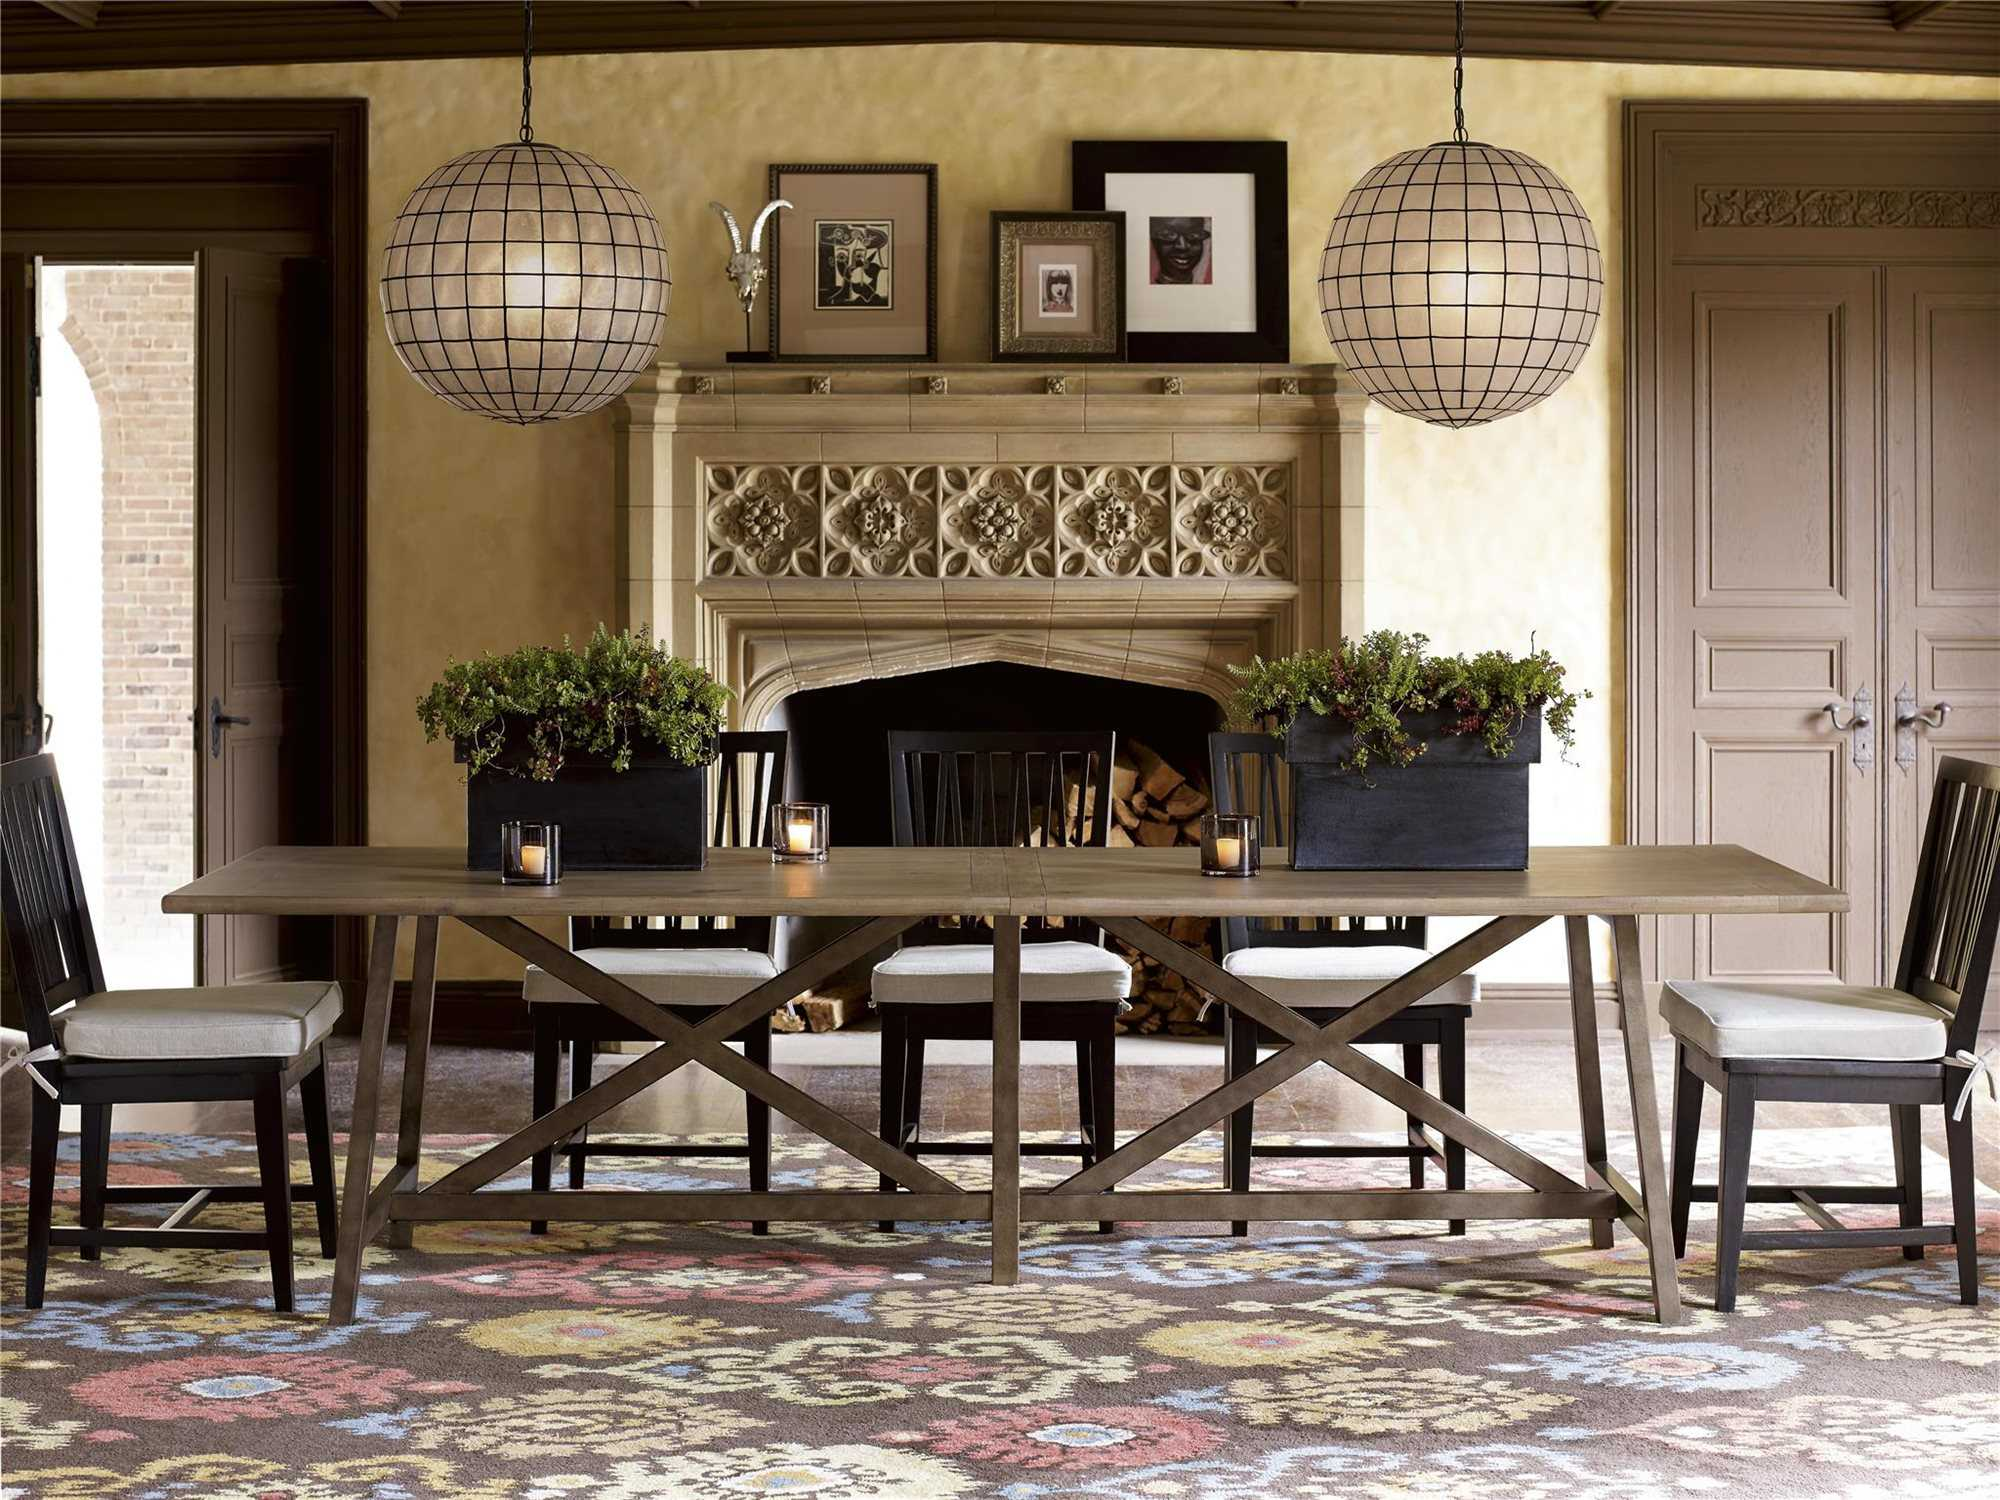 Universal Furniture Authenticity Reunion Dining Set